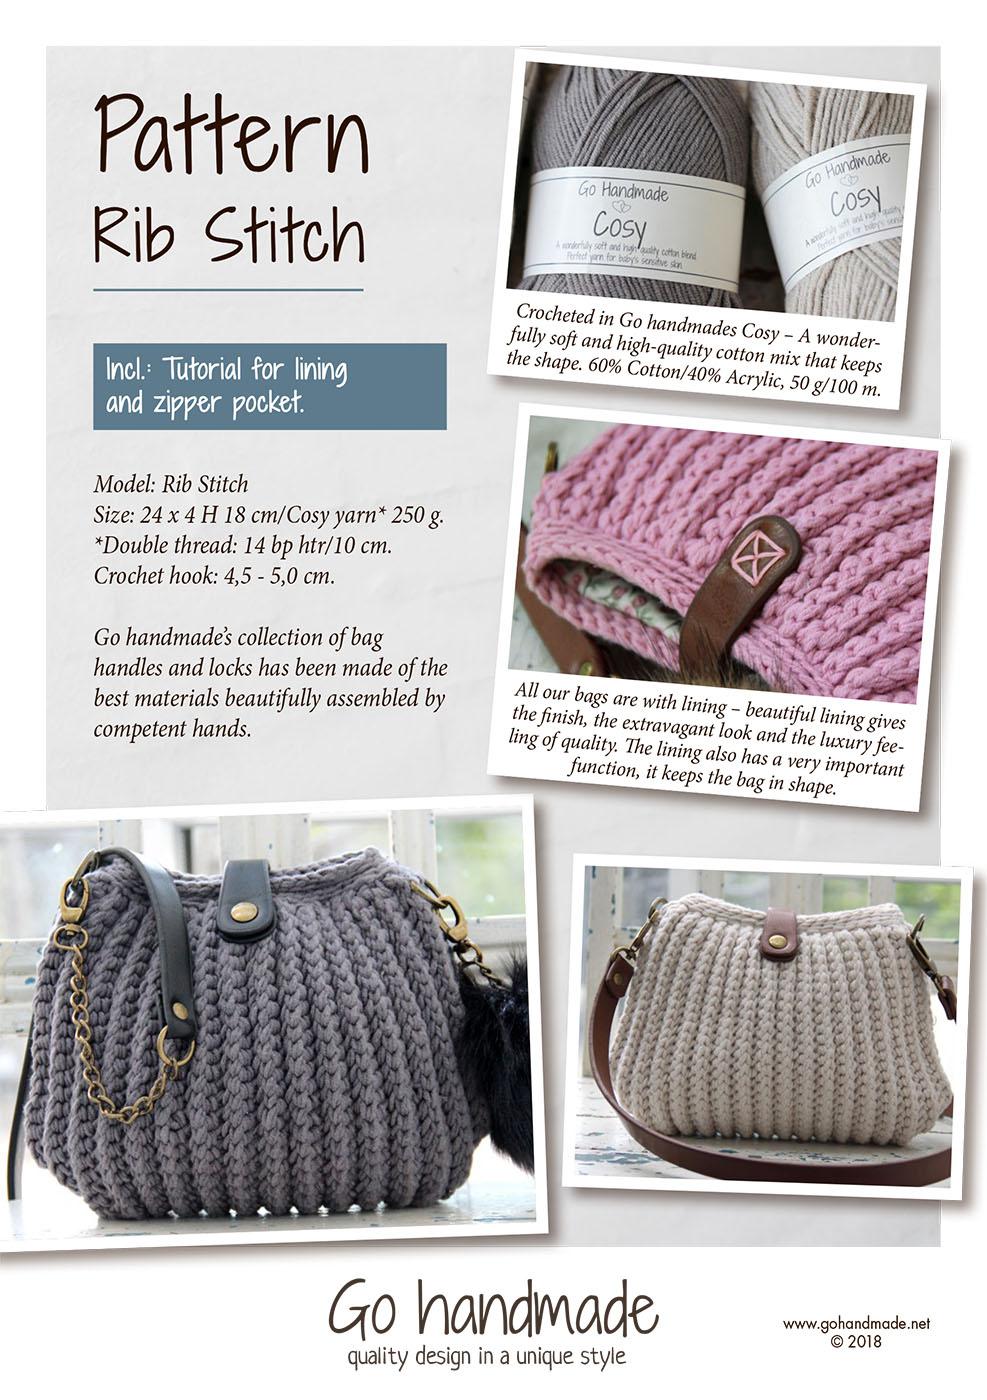 681551b8 Rib stitch - UK - Crocheted handbags, trays & baskets - Go Handmade